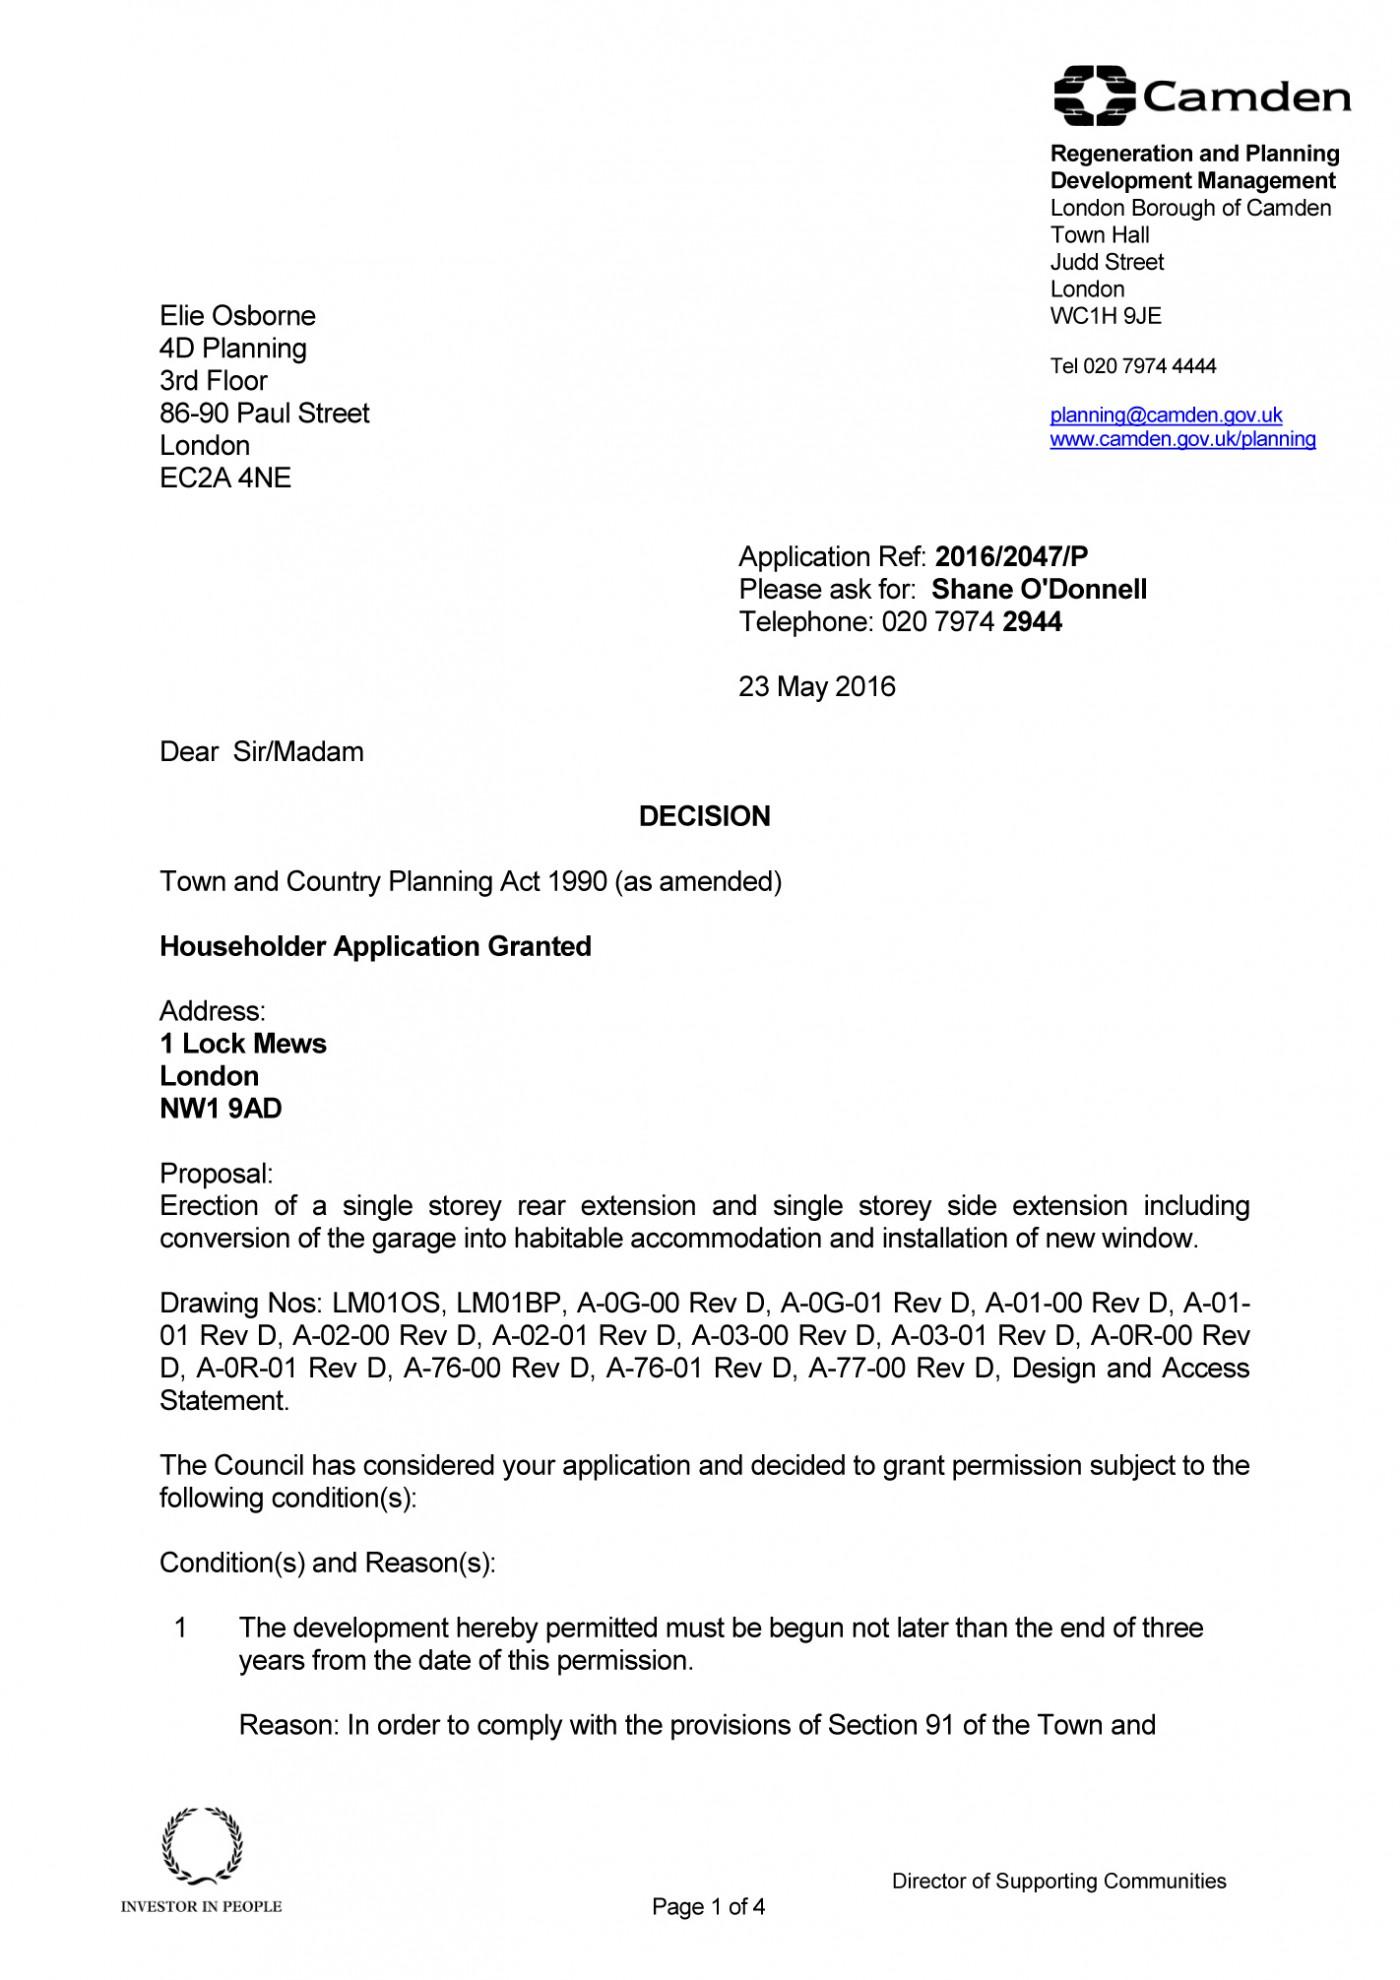 decision notice - Camden